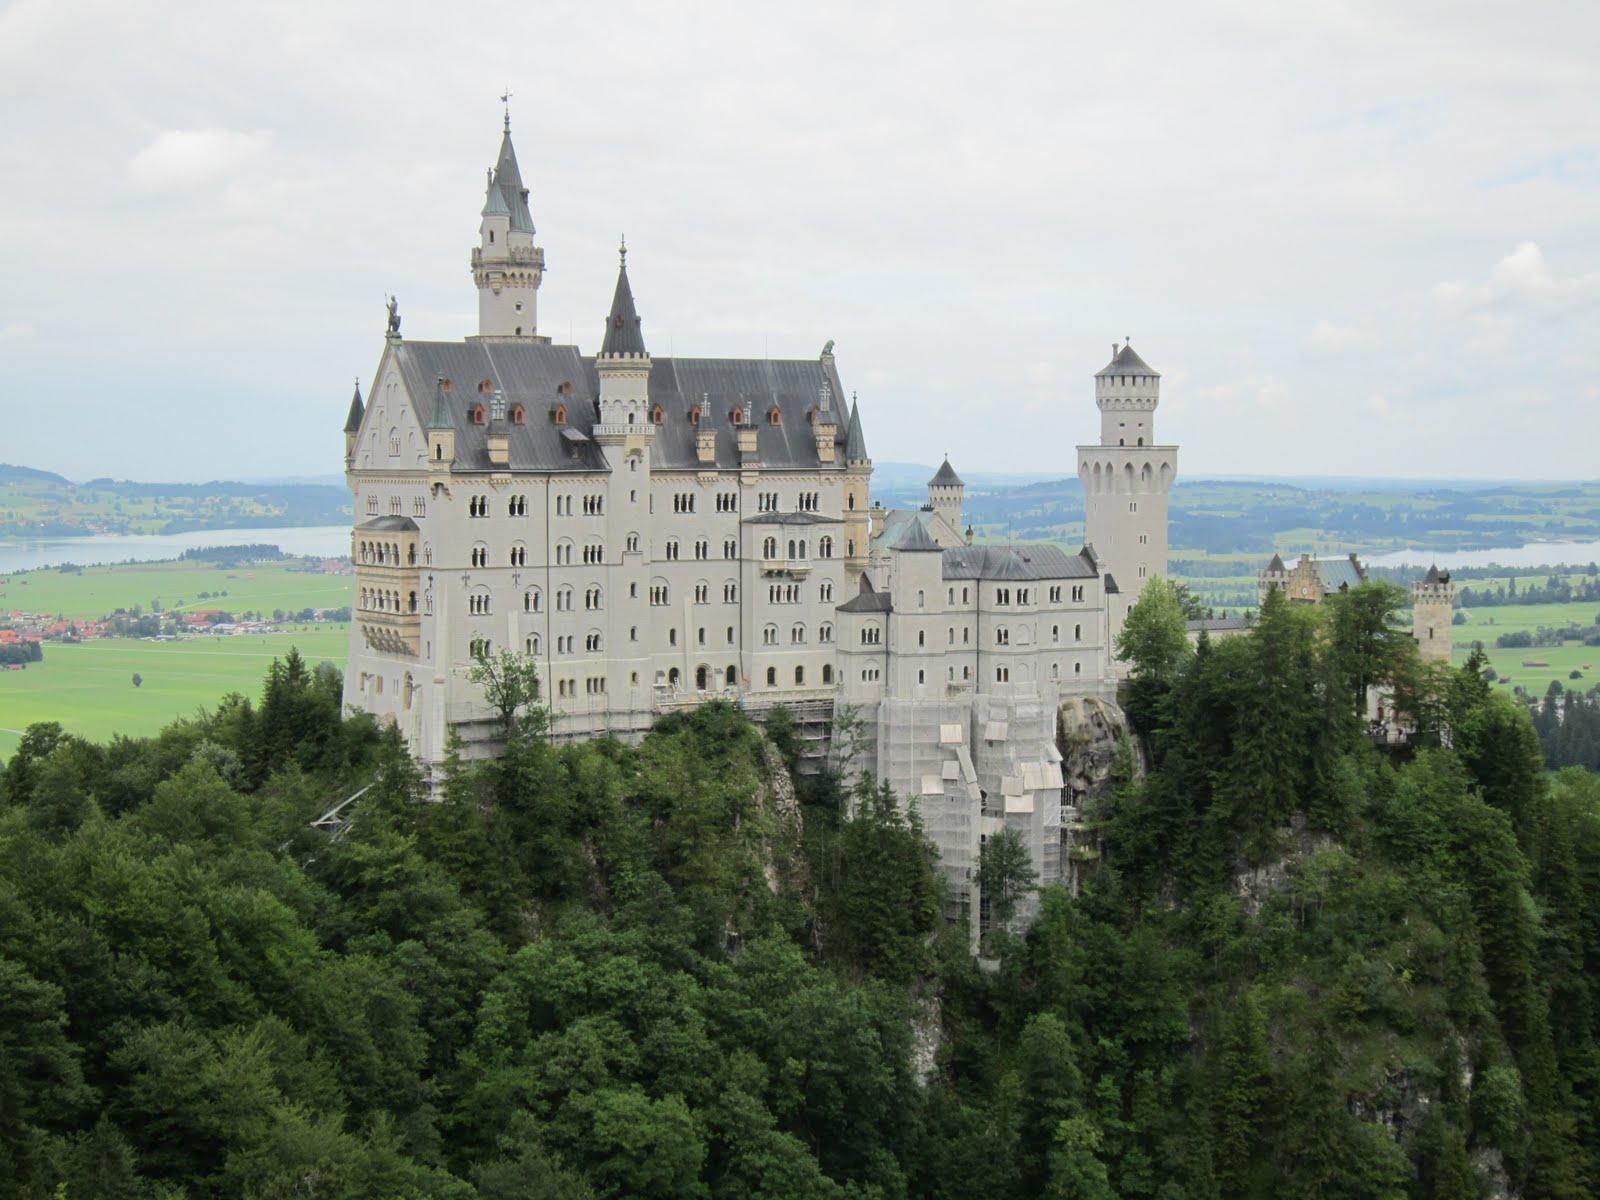 Castles Germany Bavaria Neuschwanstein Castle 2560x1600 Wallpaper 1600x1200